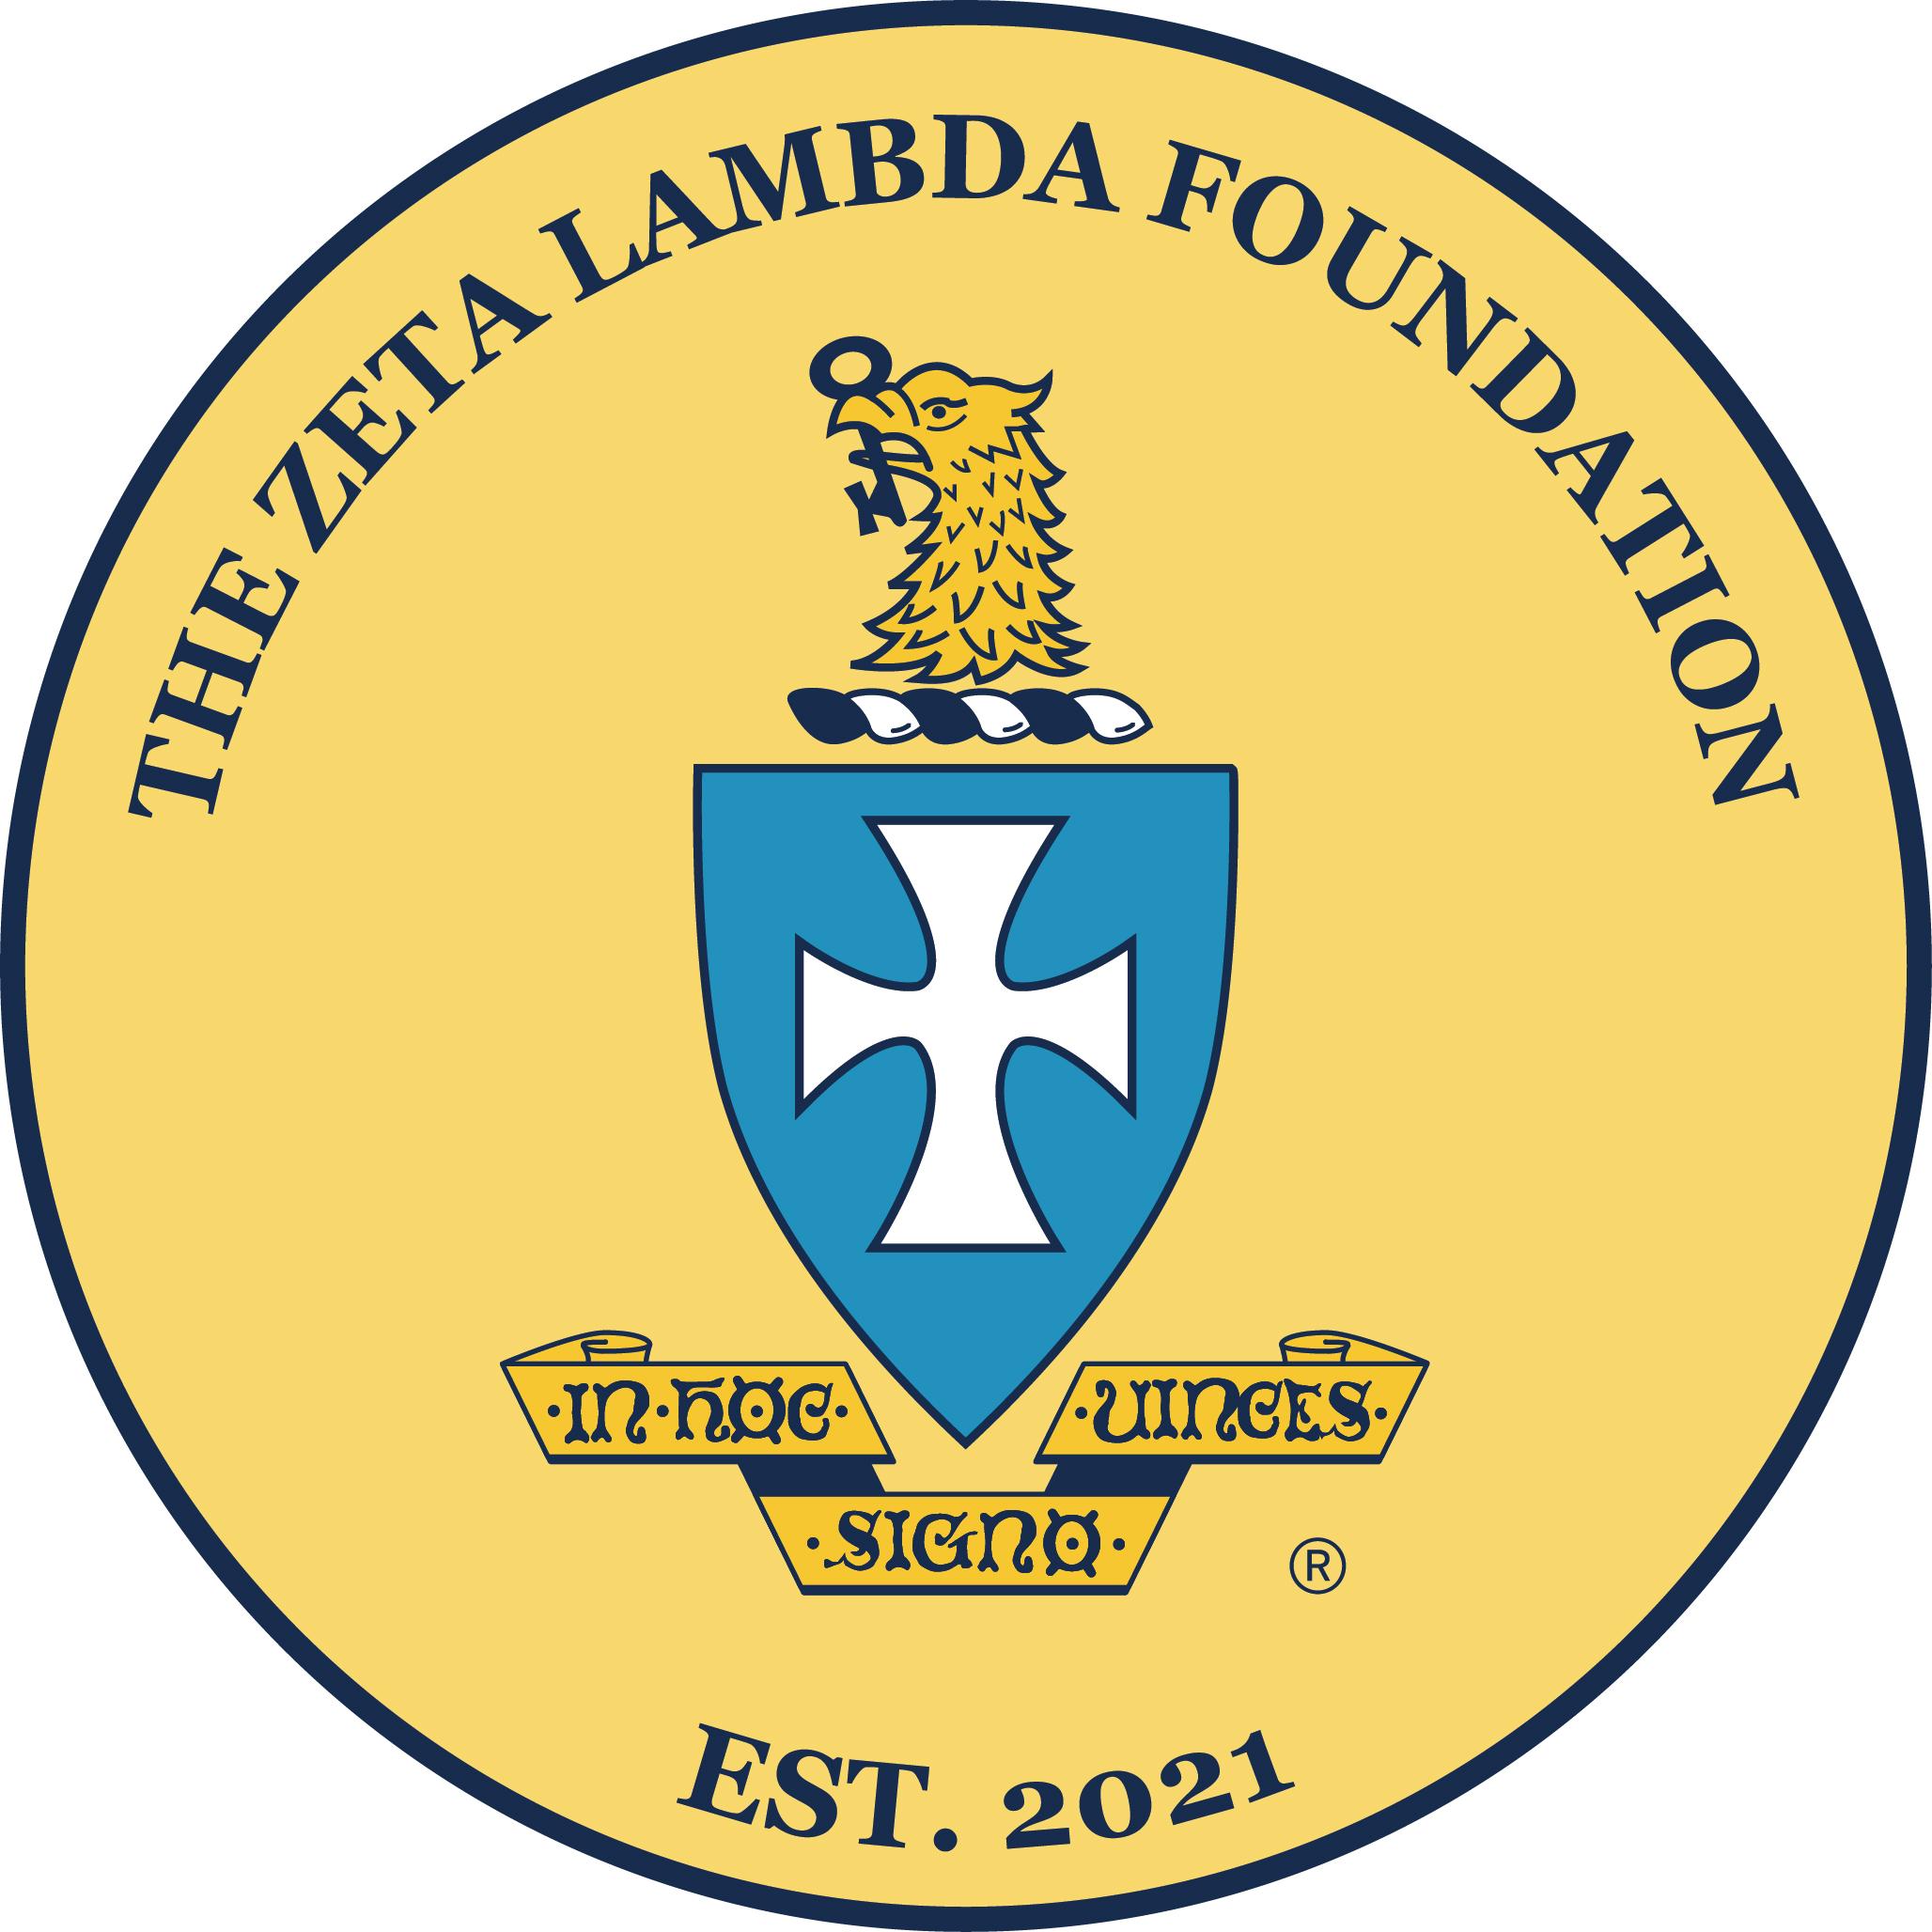 The Zeta Lambda Foundation